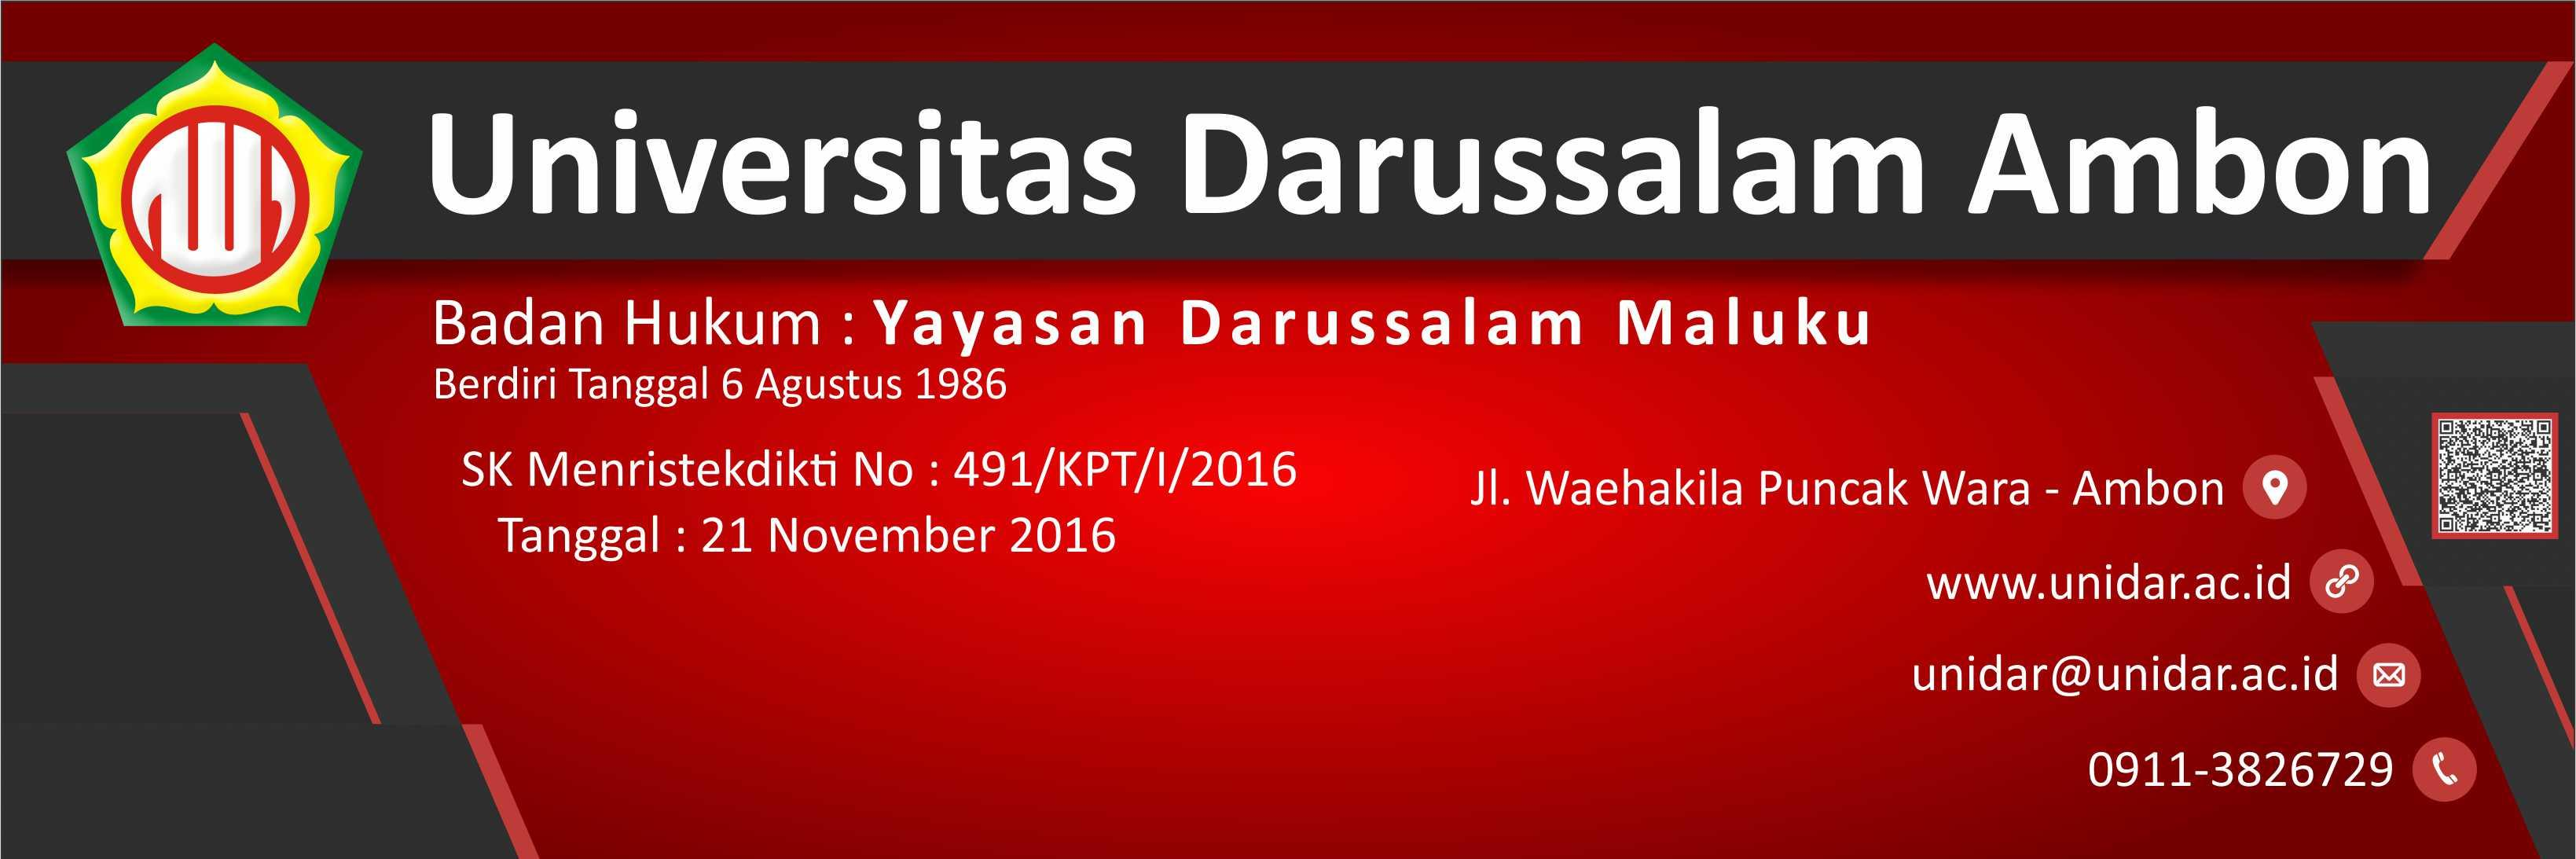 Universitas Darussalam Ambon's official Twitter account